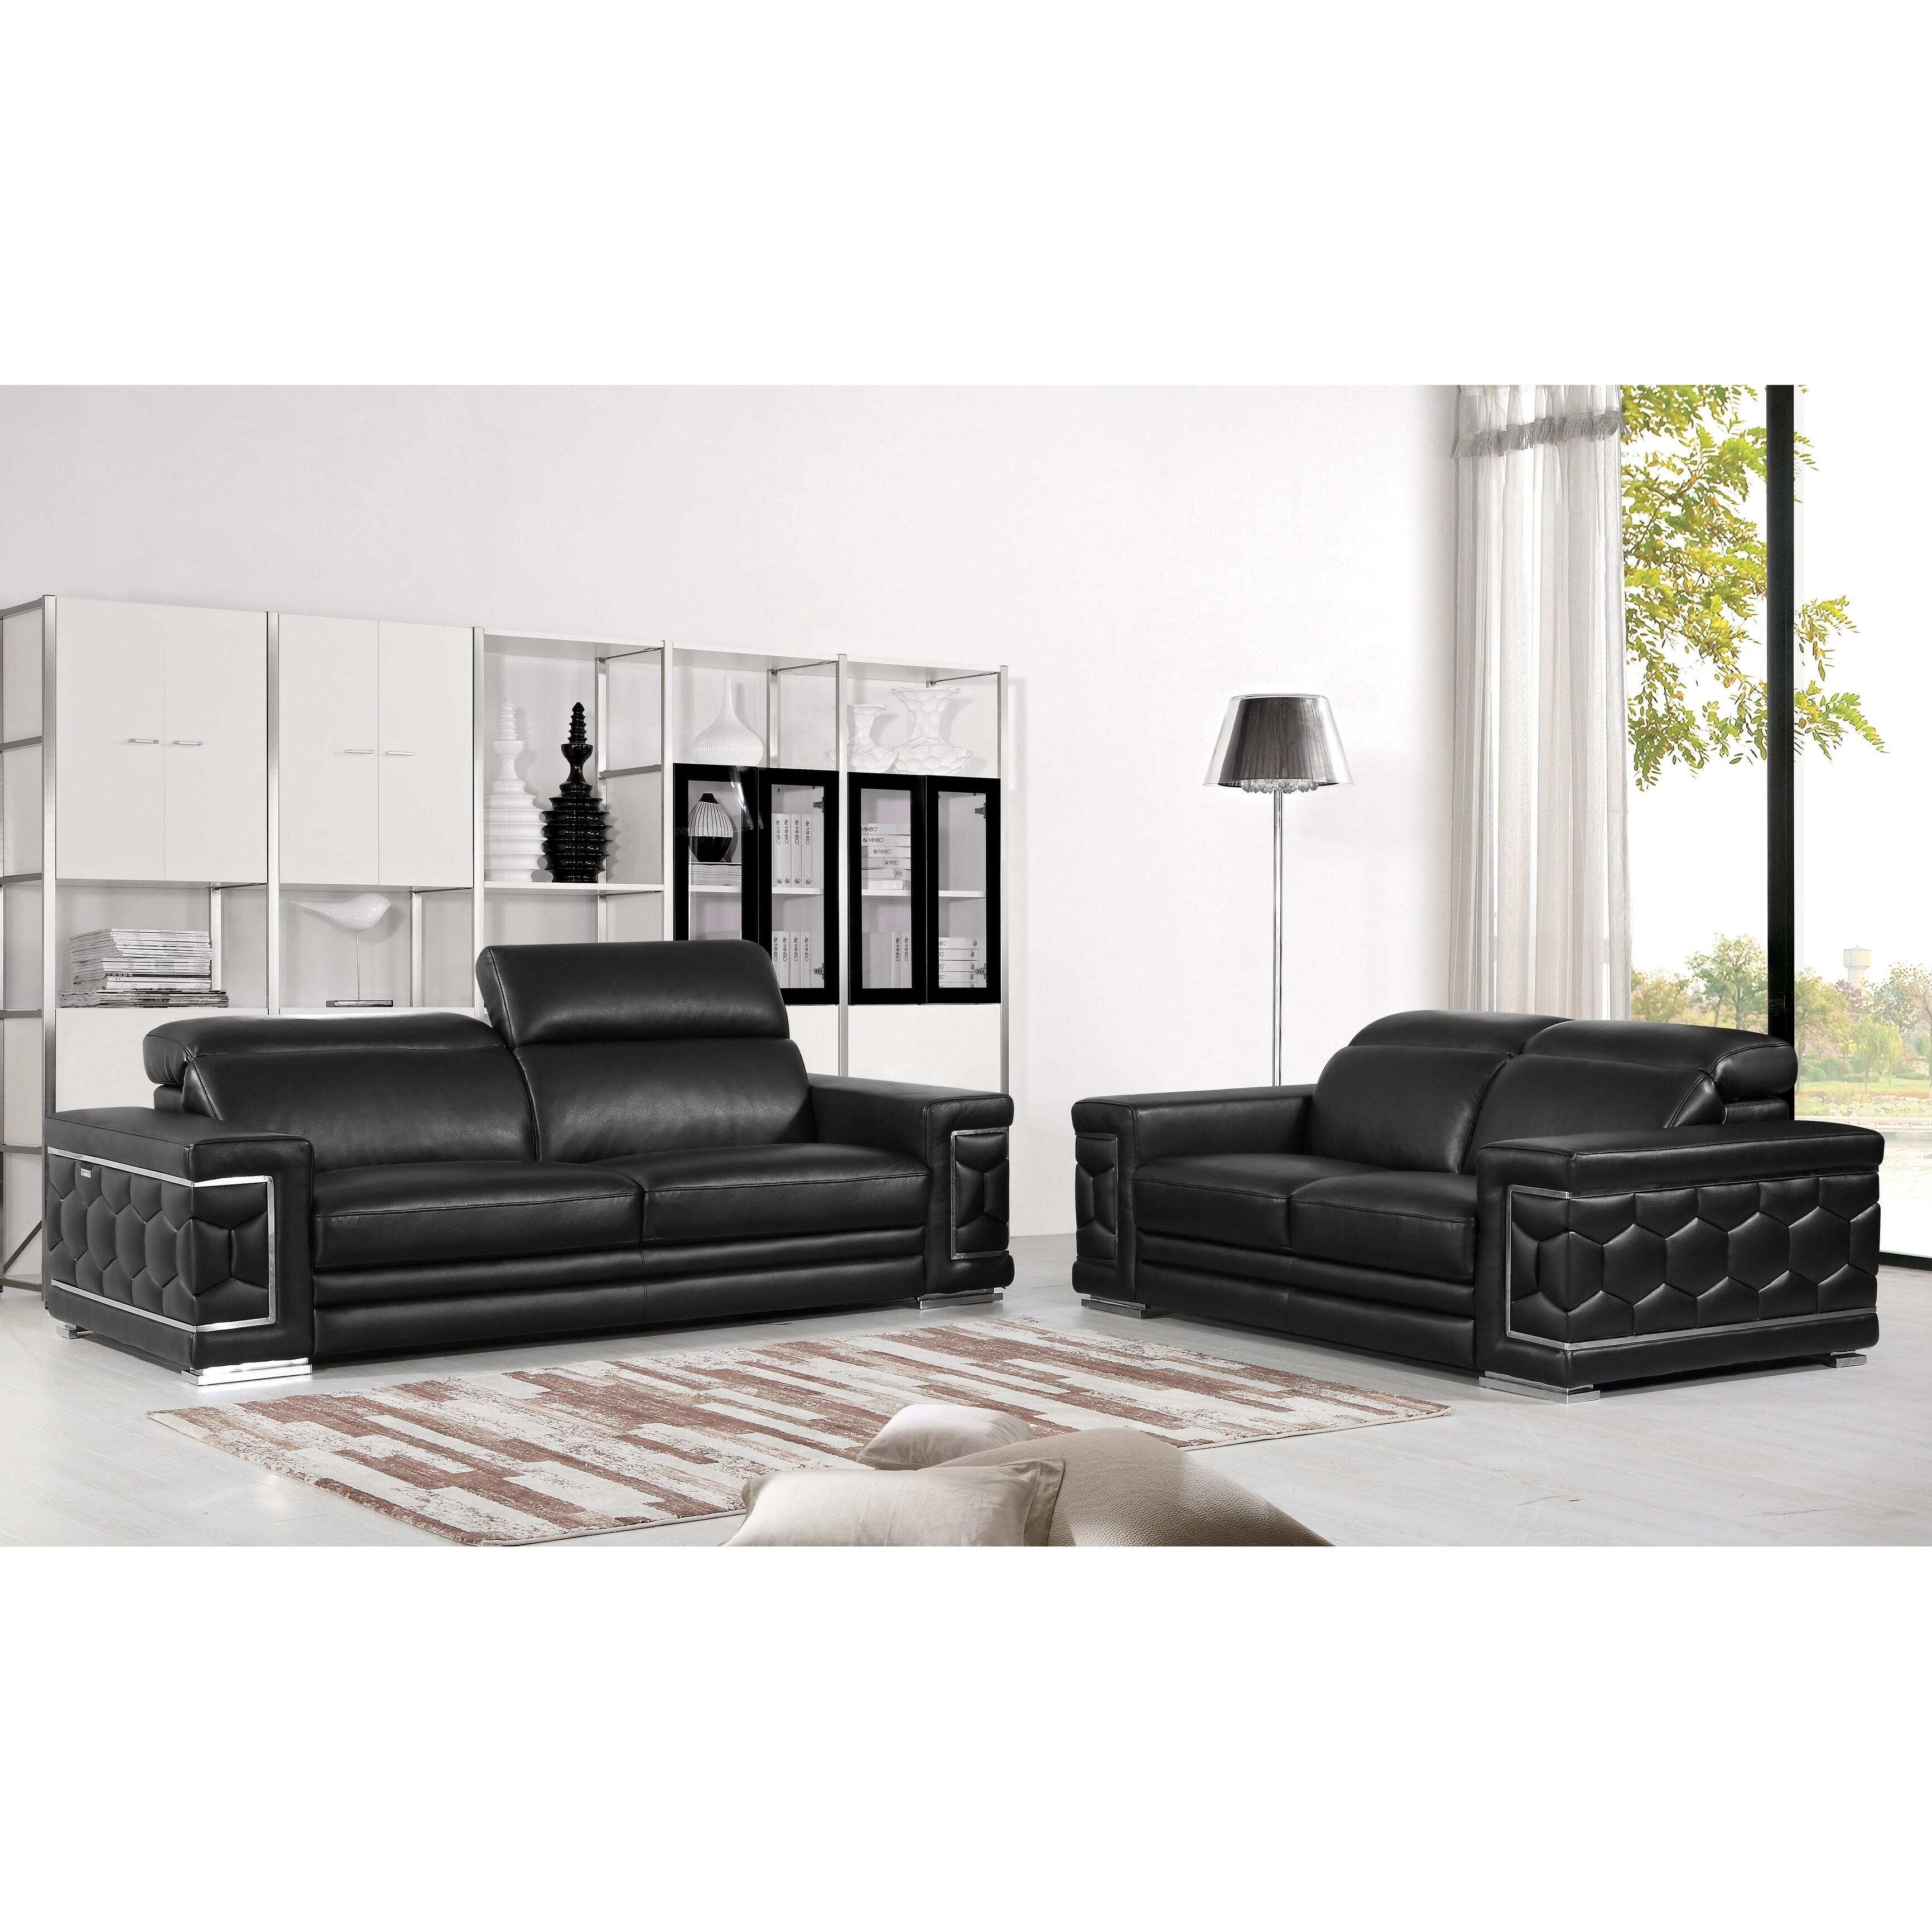 DivanItalia Ferrara Luxury Italian Leather Upholstered 2-Piece ...